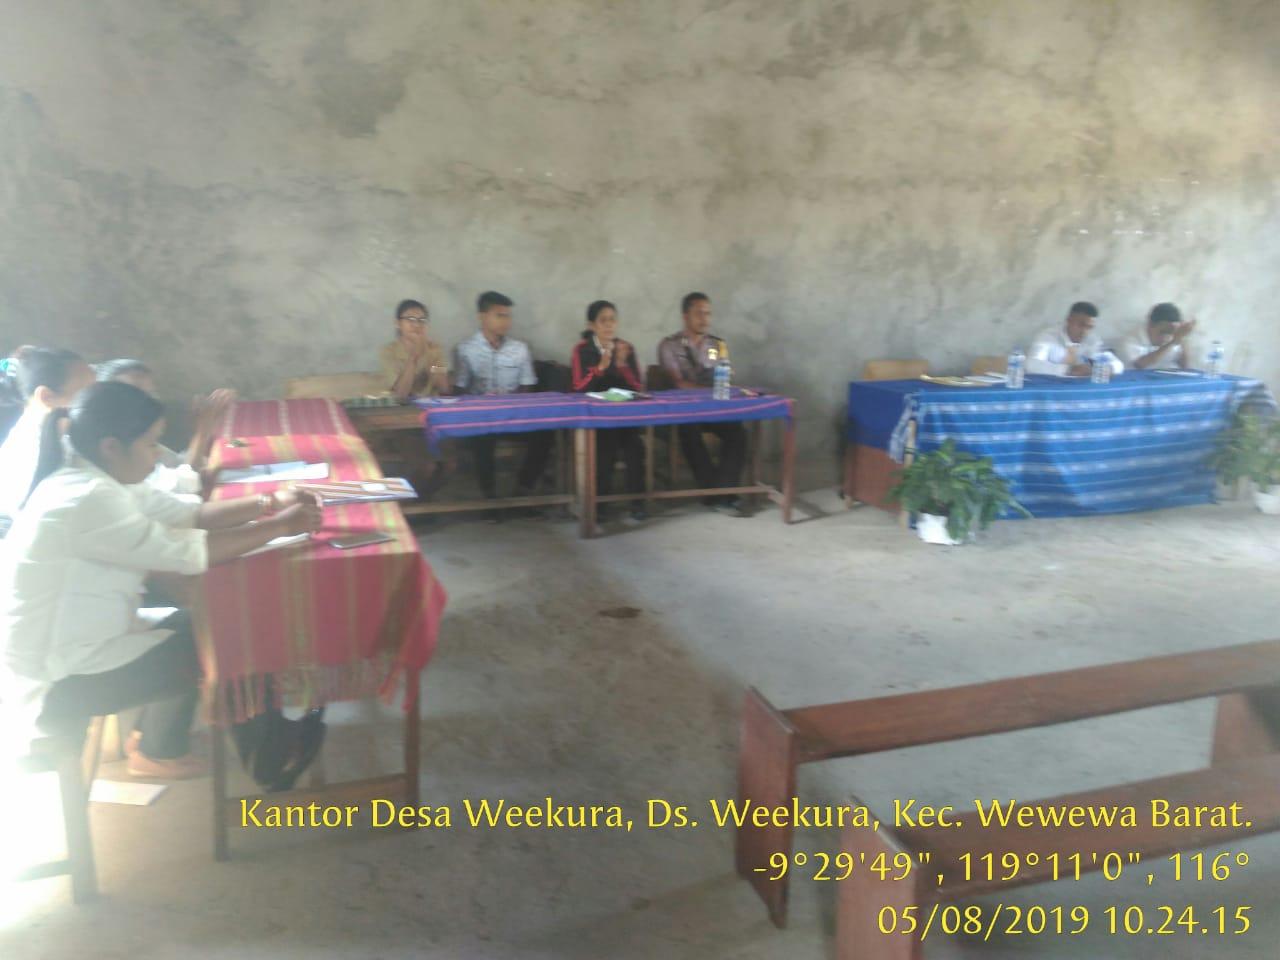 Brigpol Yakobus Hadiri Rapat Pembangunan SMP Gloria Dei Weekura